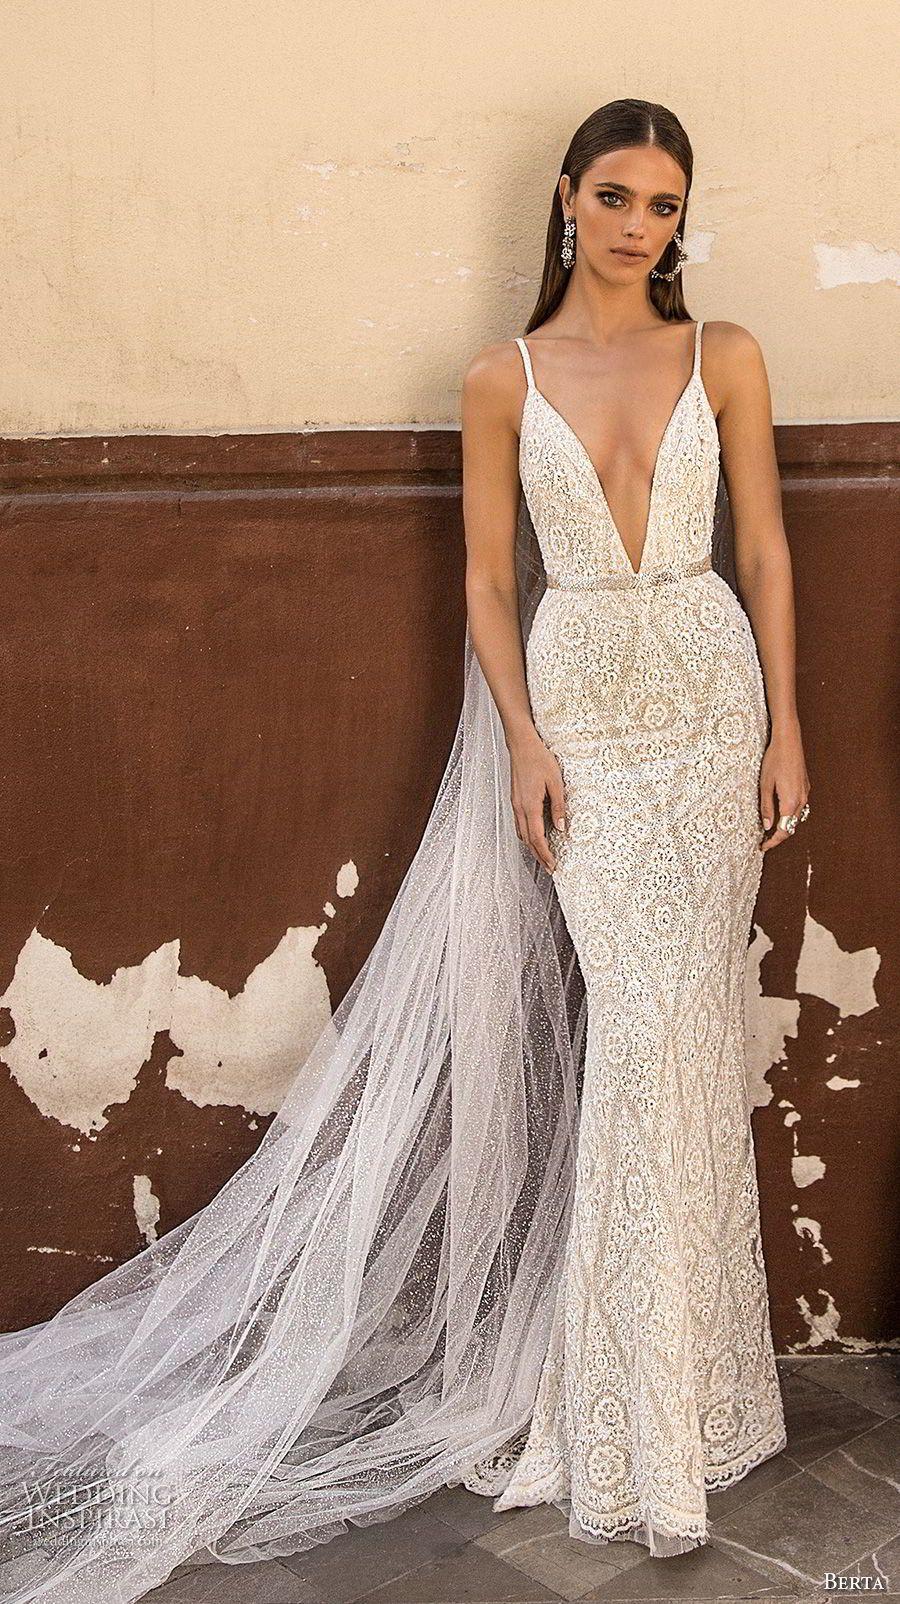 berta fall 2018 bridal sleeveless spaghetti strap deep v neck full  embellishment elegant sexy sheath wedding dress open back sweep train (25)  mv -- Berta ... 84c98cca8580